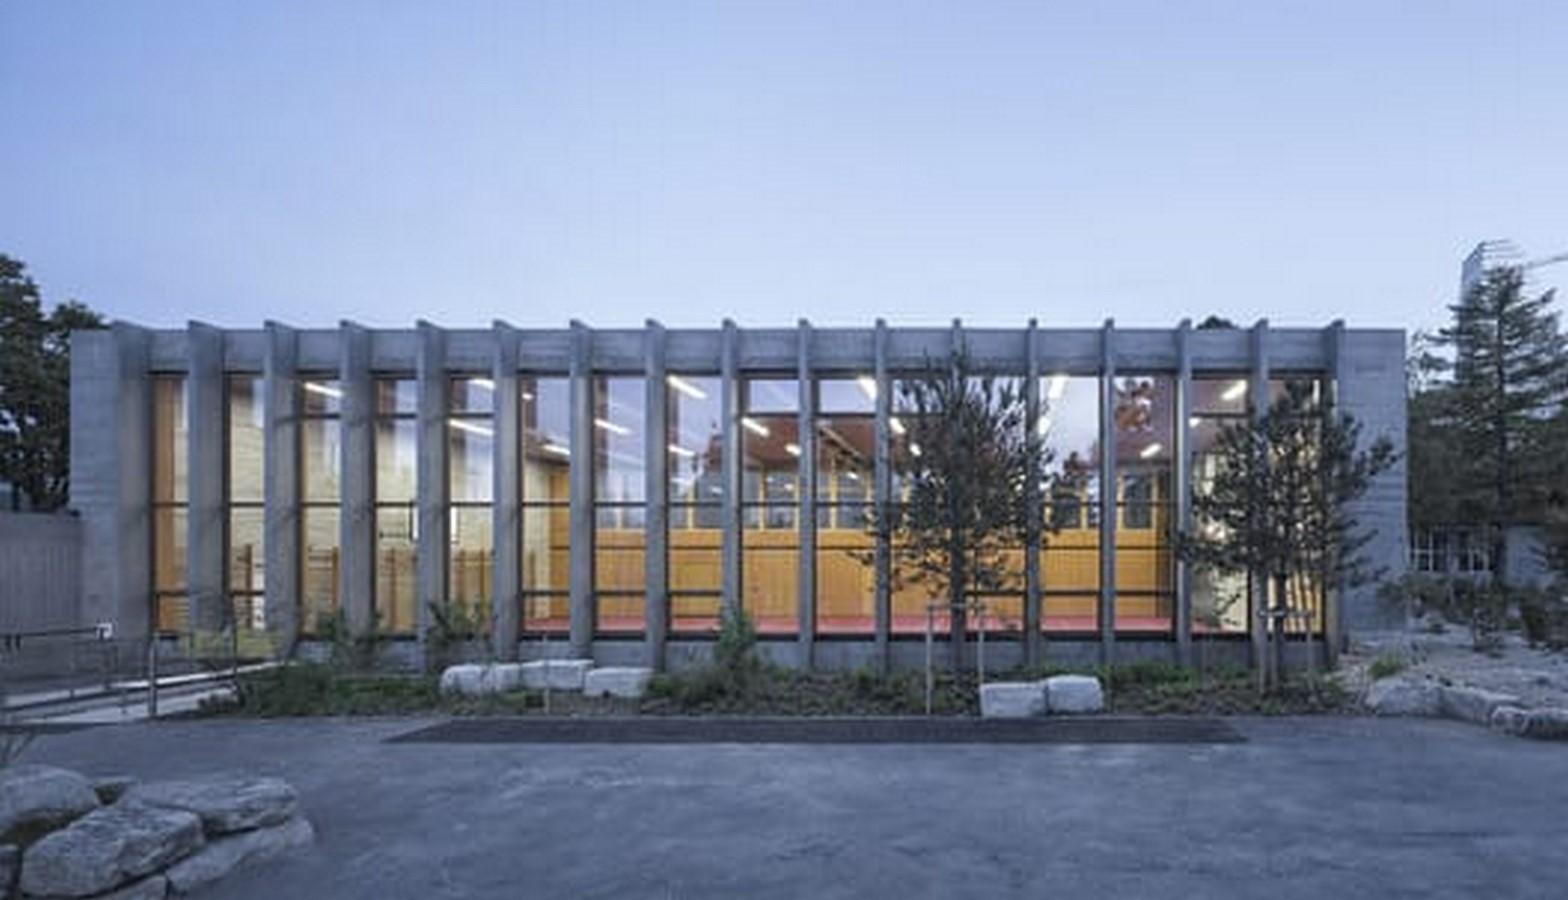 Architects in Basel - Top 80 Architects in Basel - Sheet52